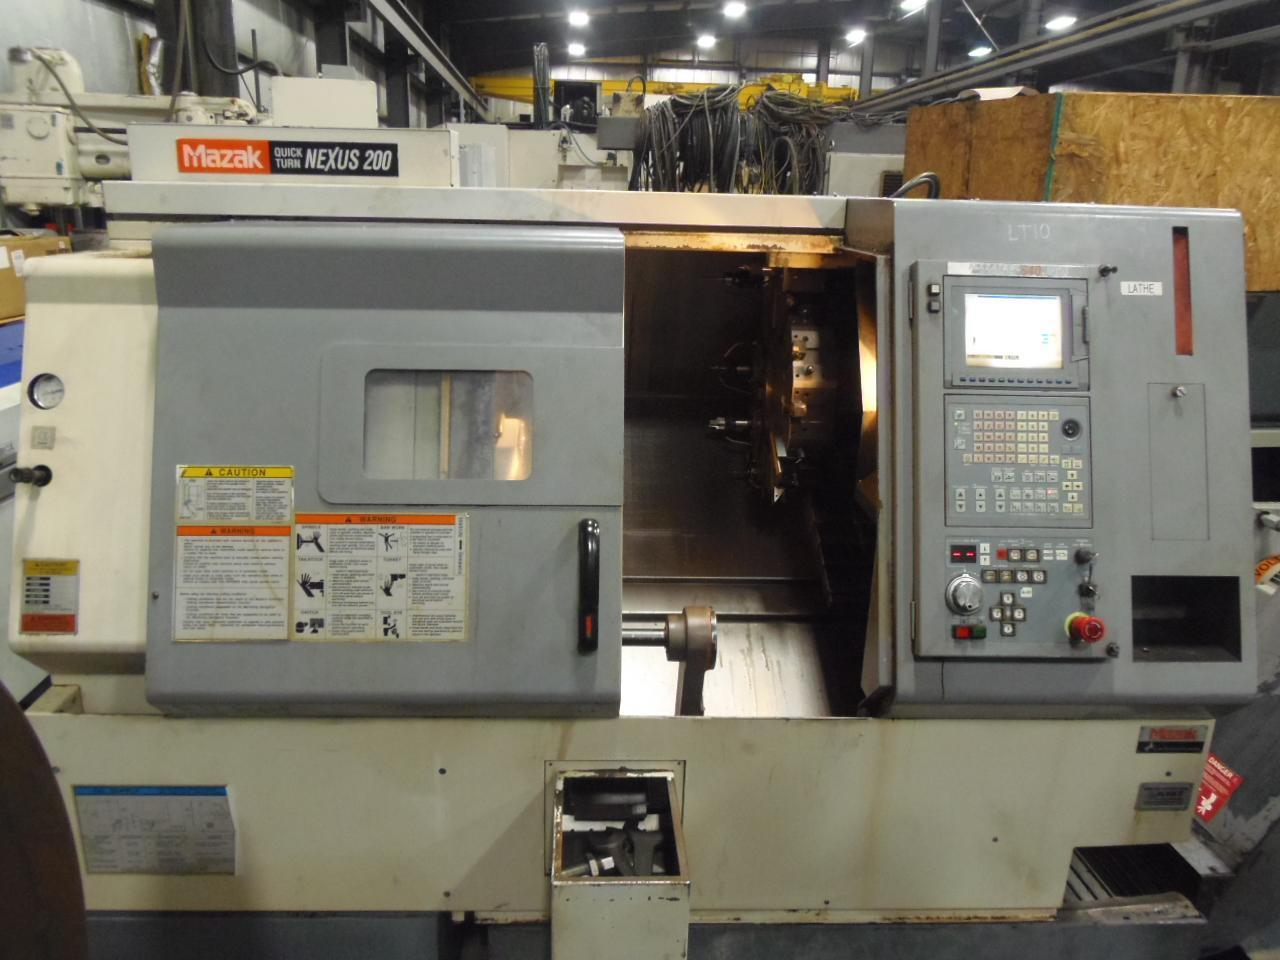 MAZAK QTN-200 CNC LATHE, 24 x 26, FUSION 640T CONTROL, IEMCA BARFEED, 2003